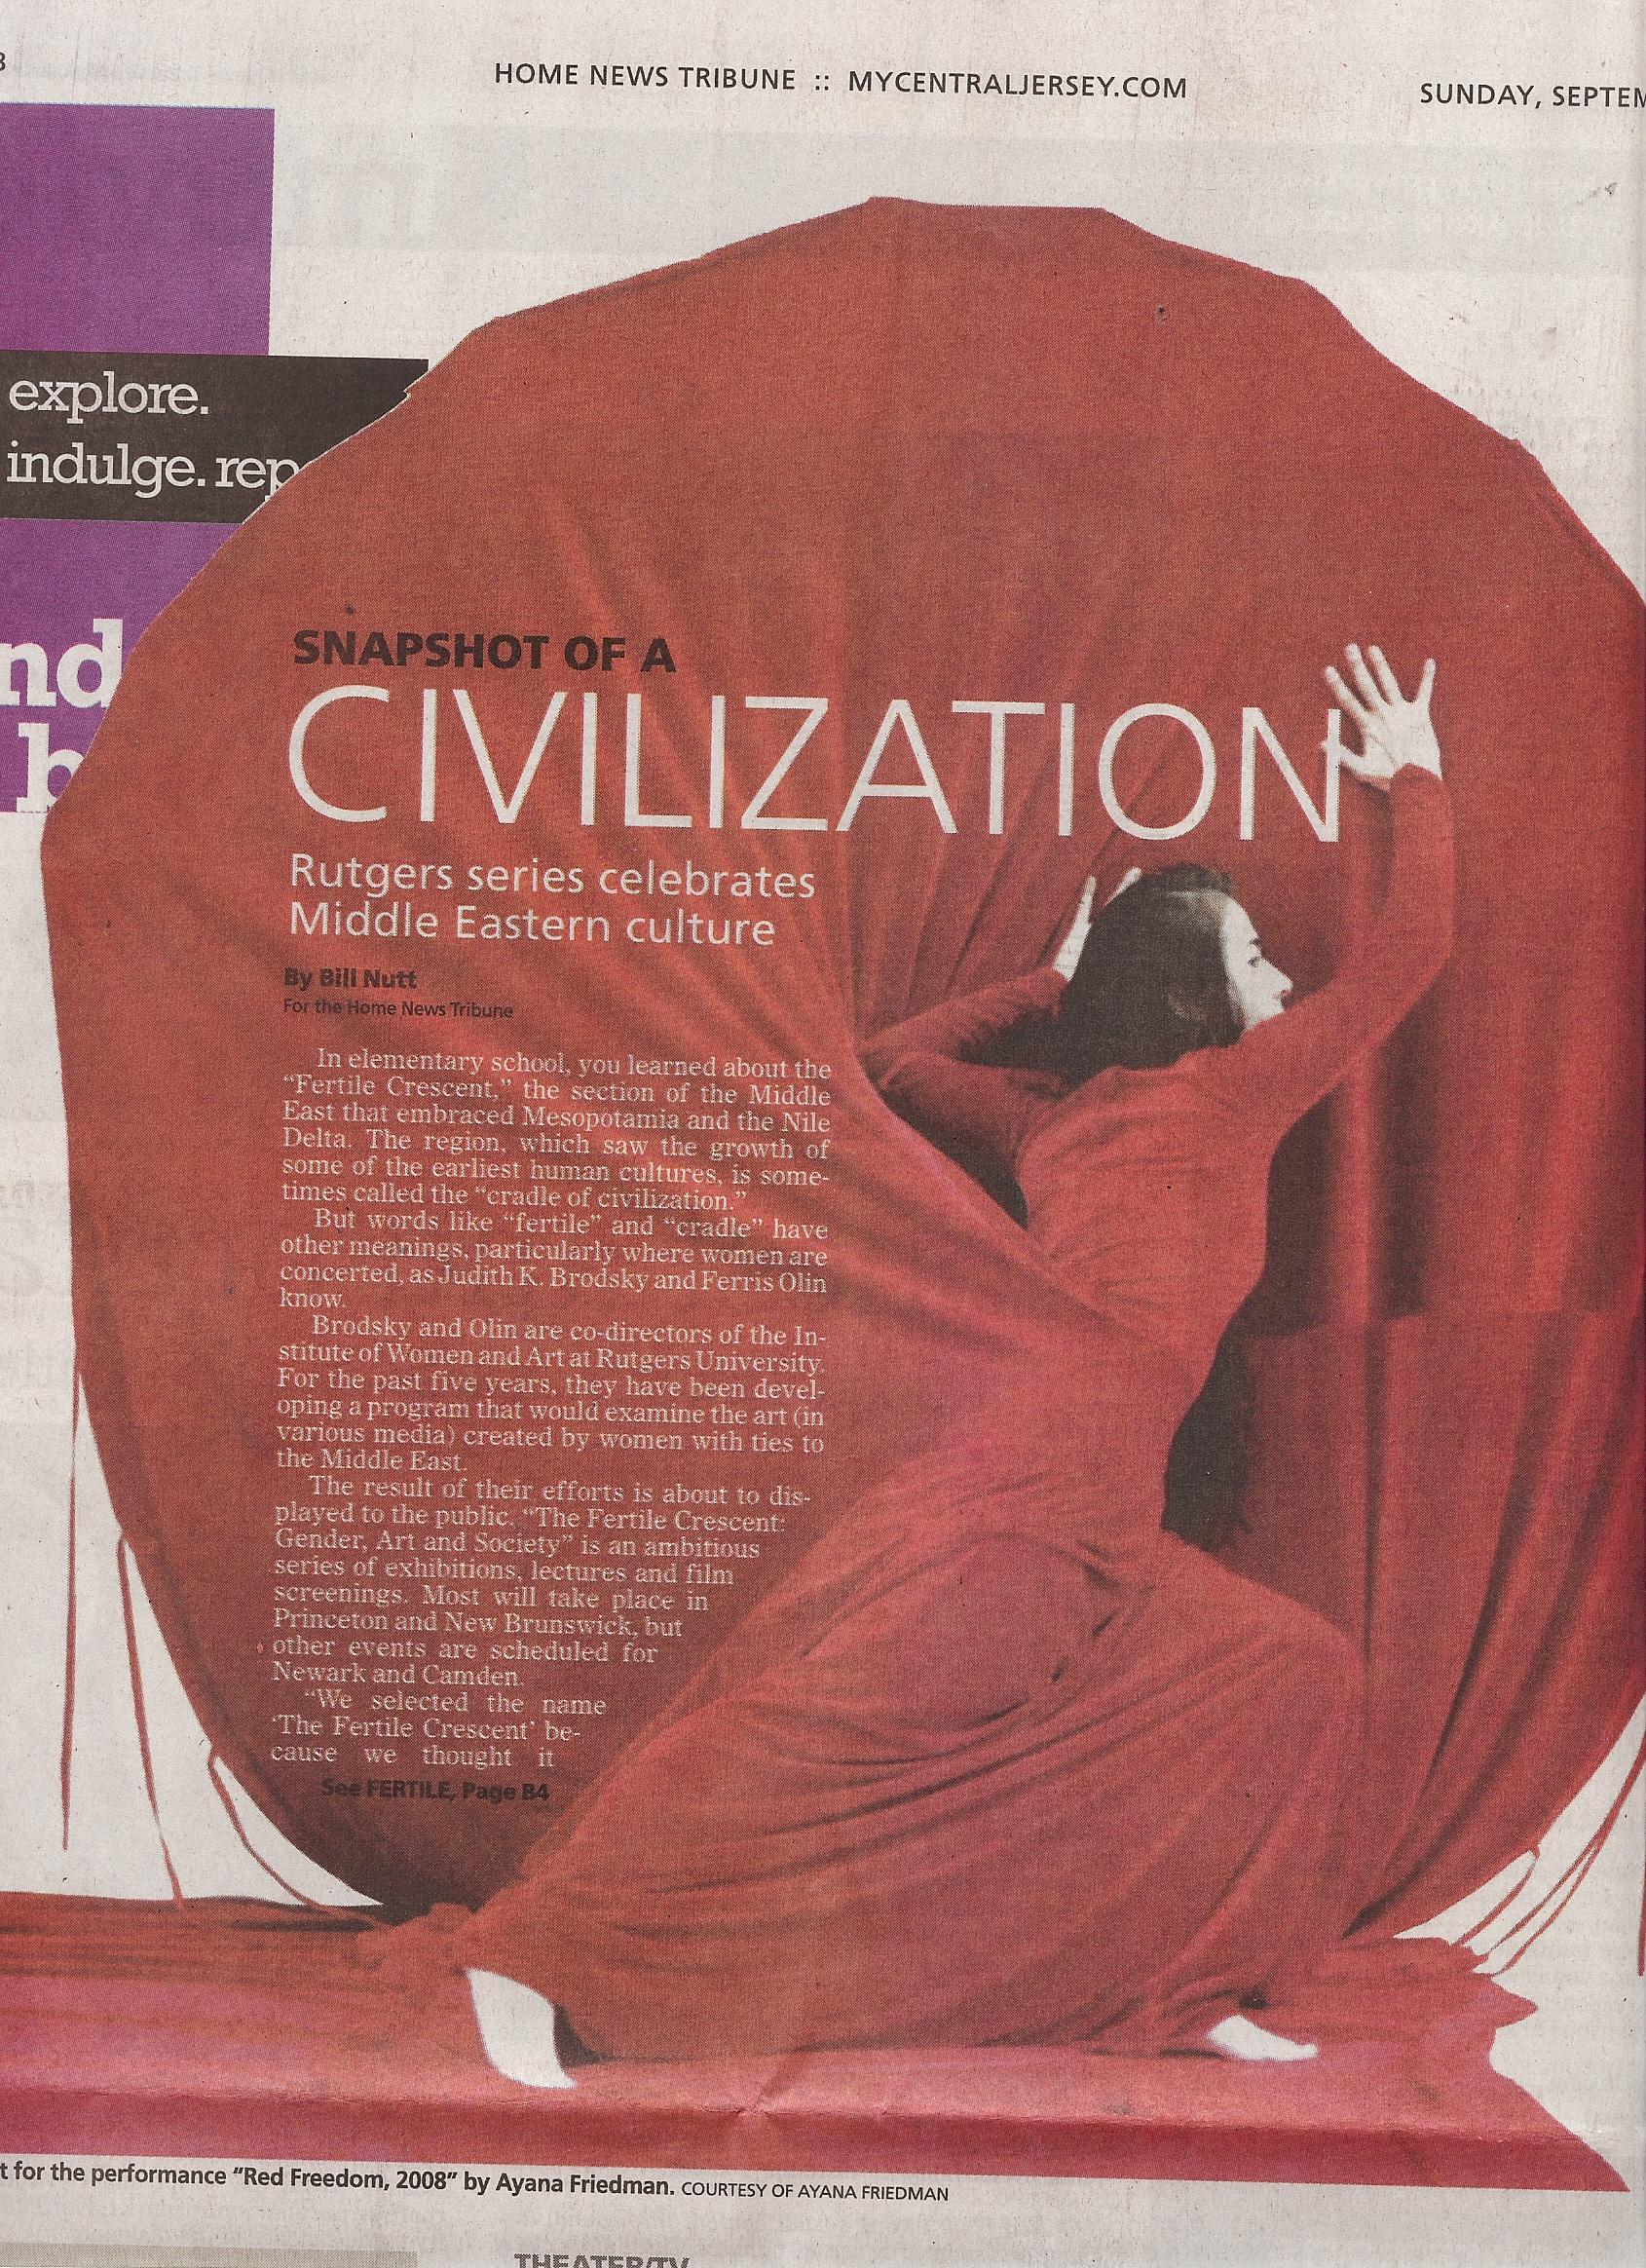 Snapshot of civilization